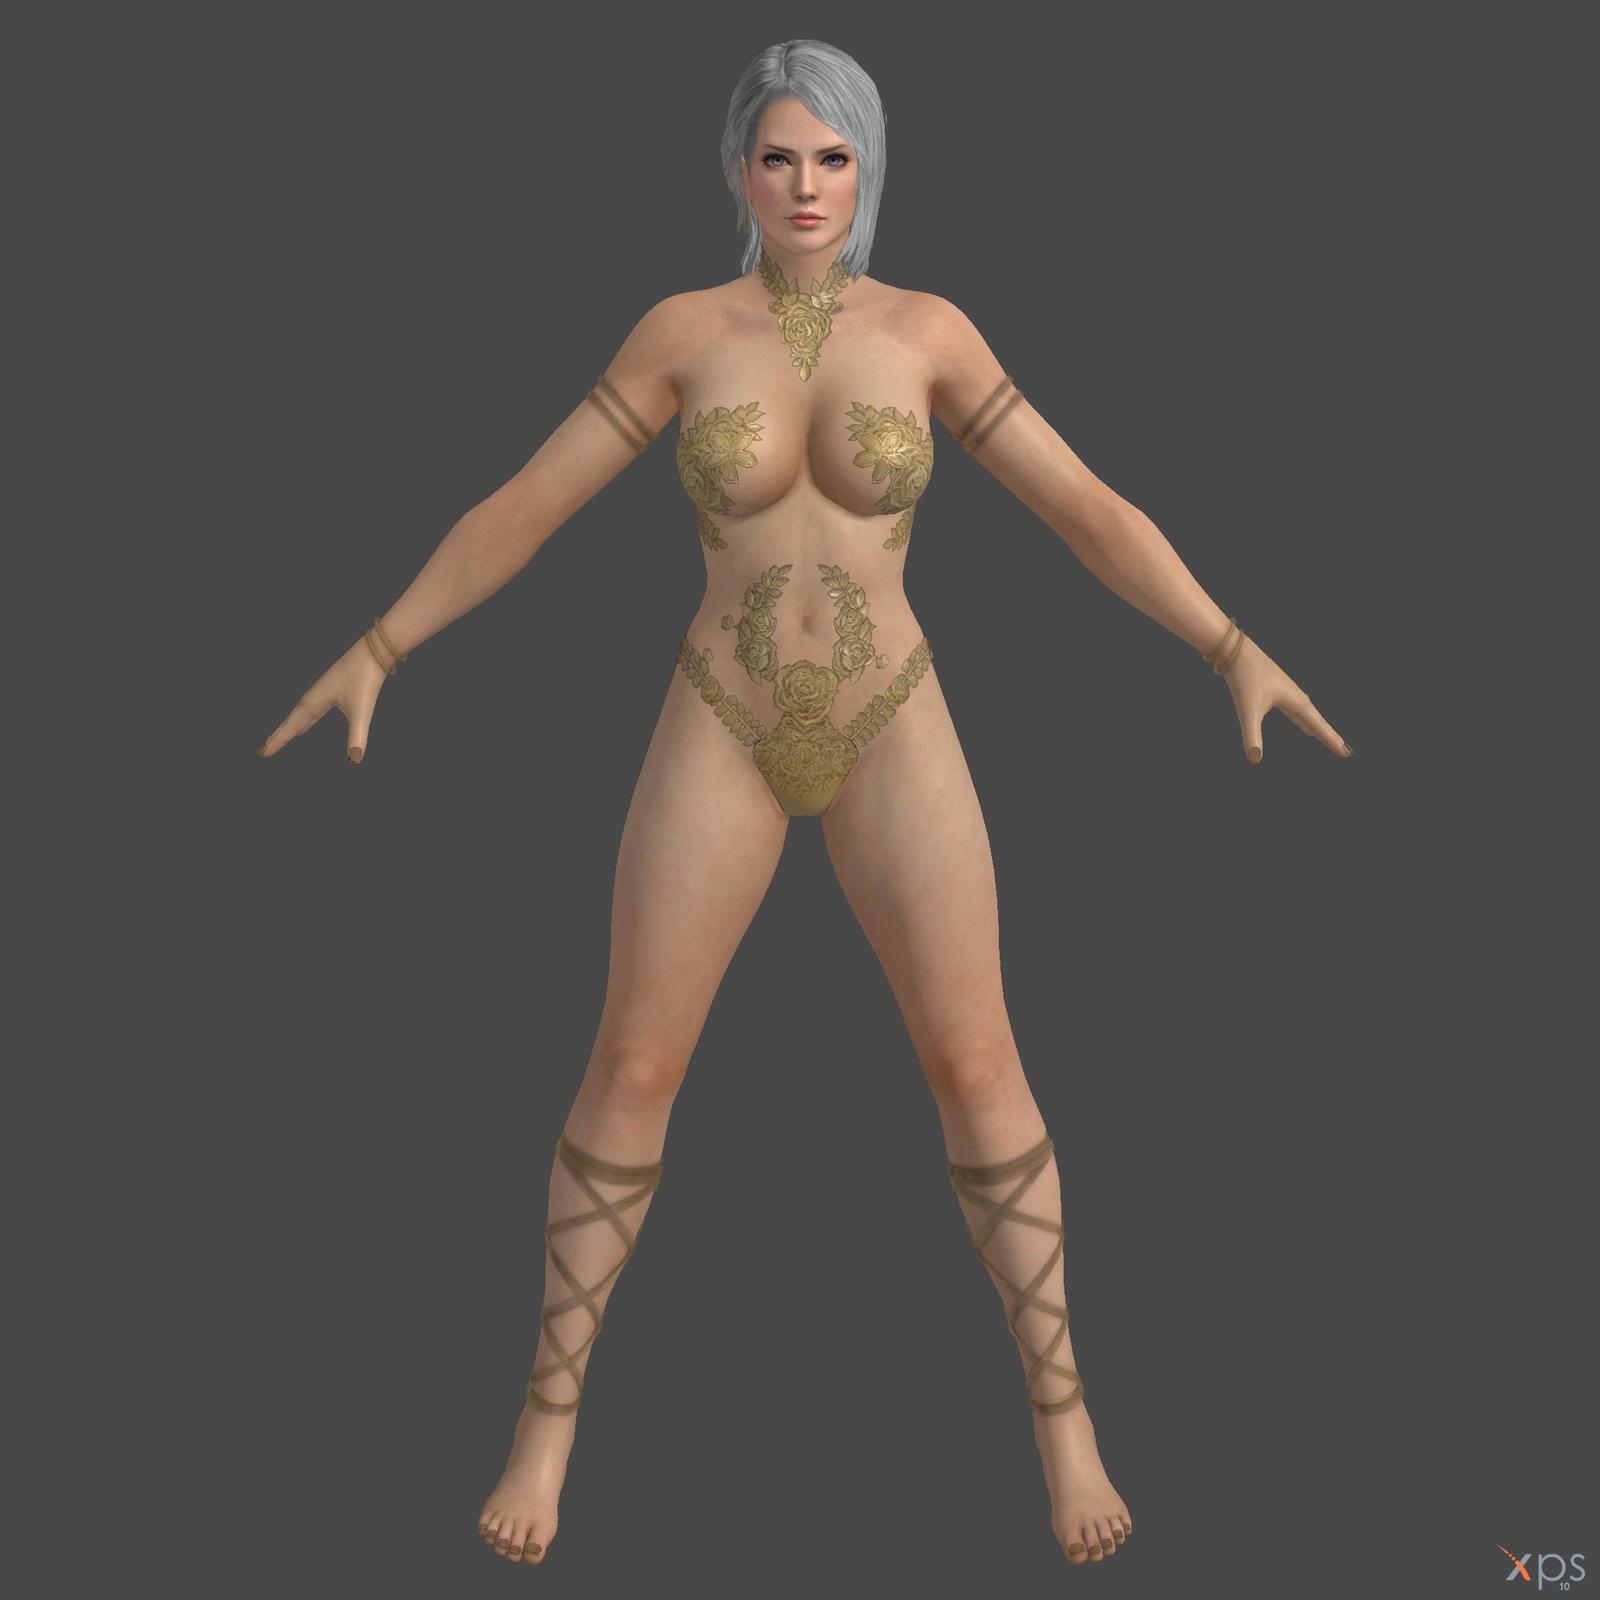 Doa5u nude fucking pic